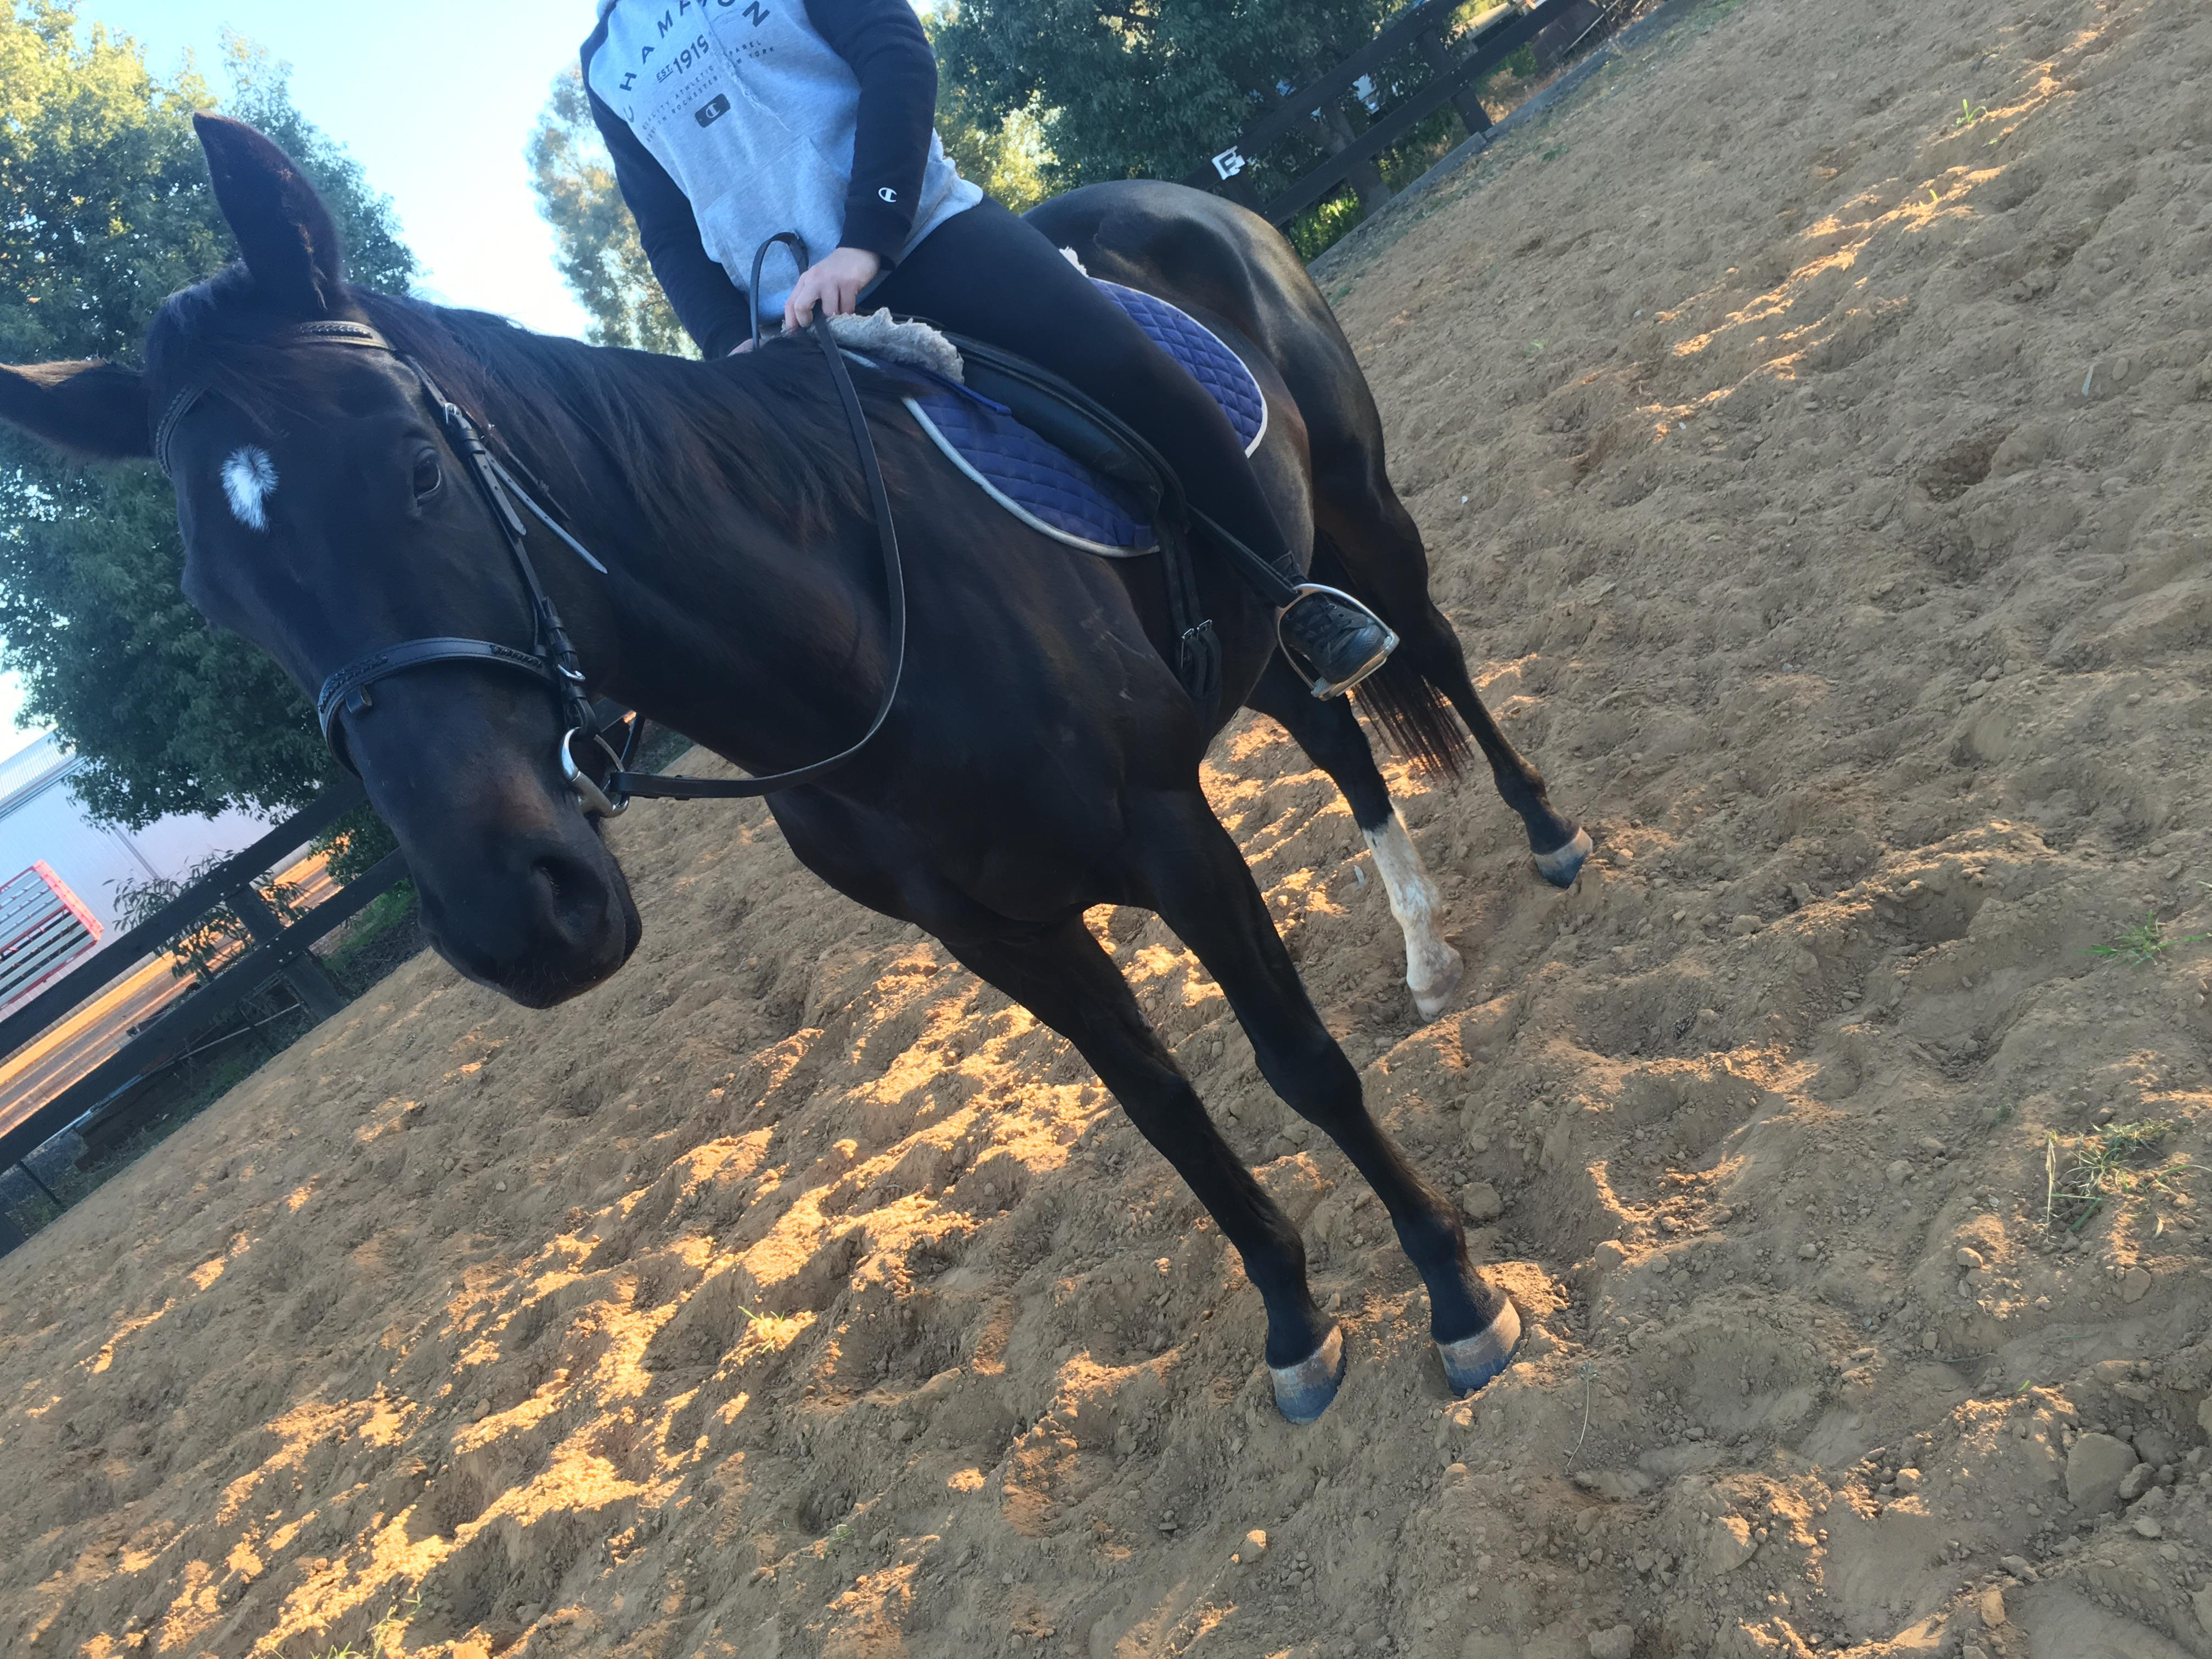 Stunning black mare